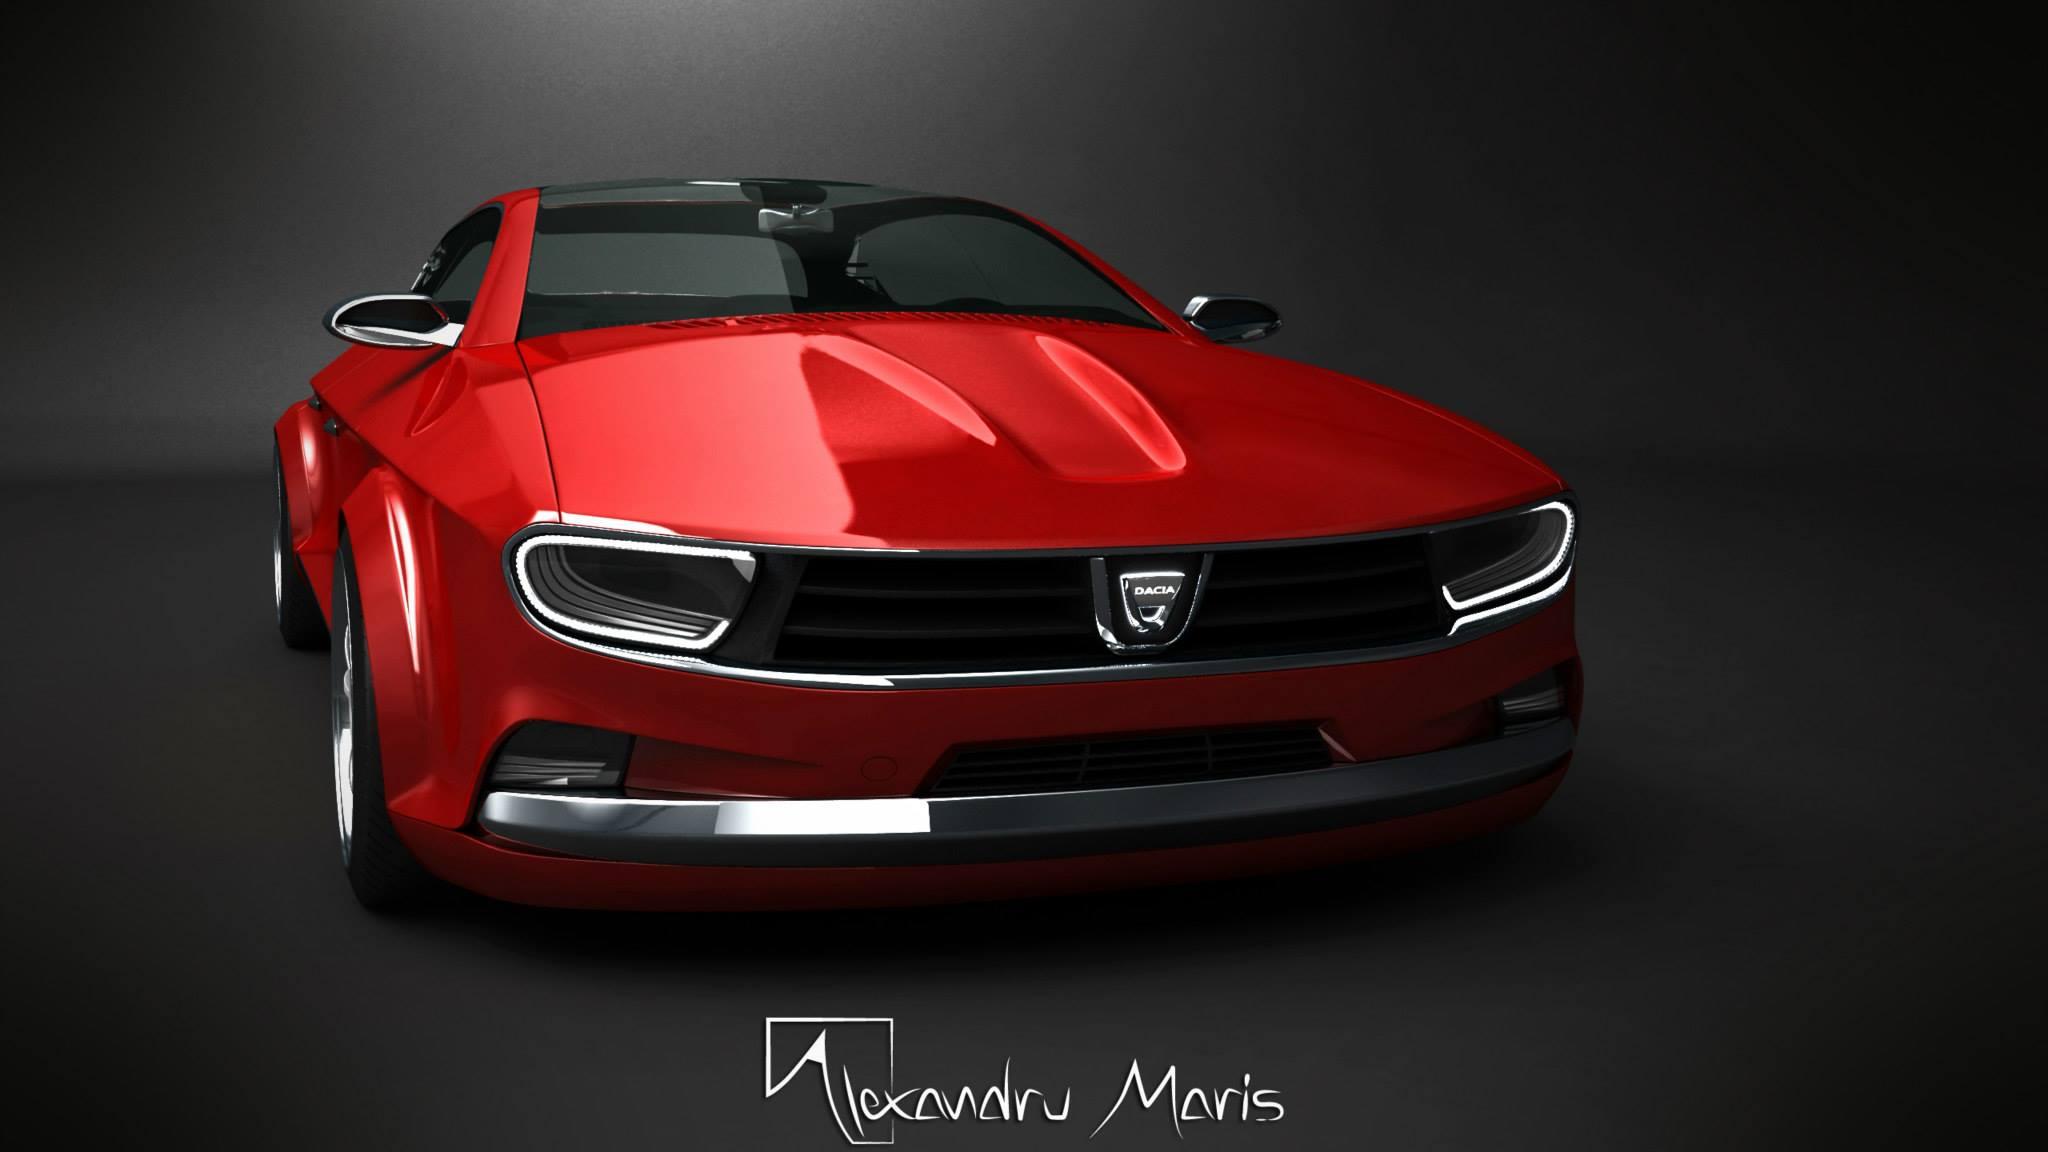 De la Dacia 1300… spre Dacia 1300!